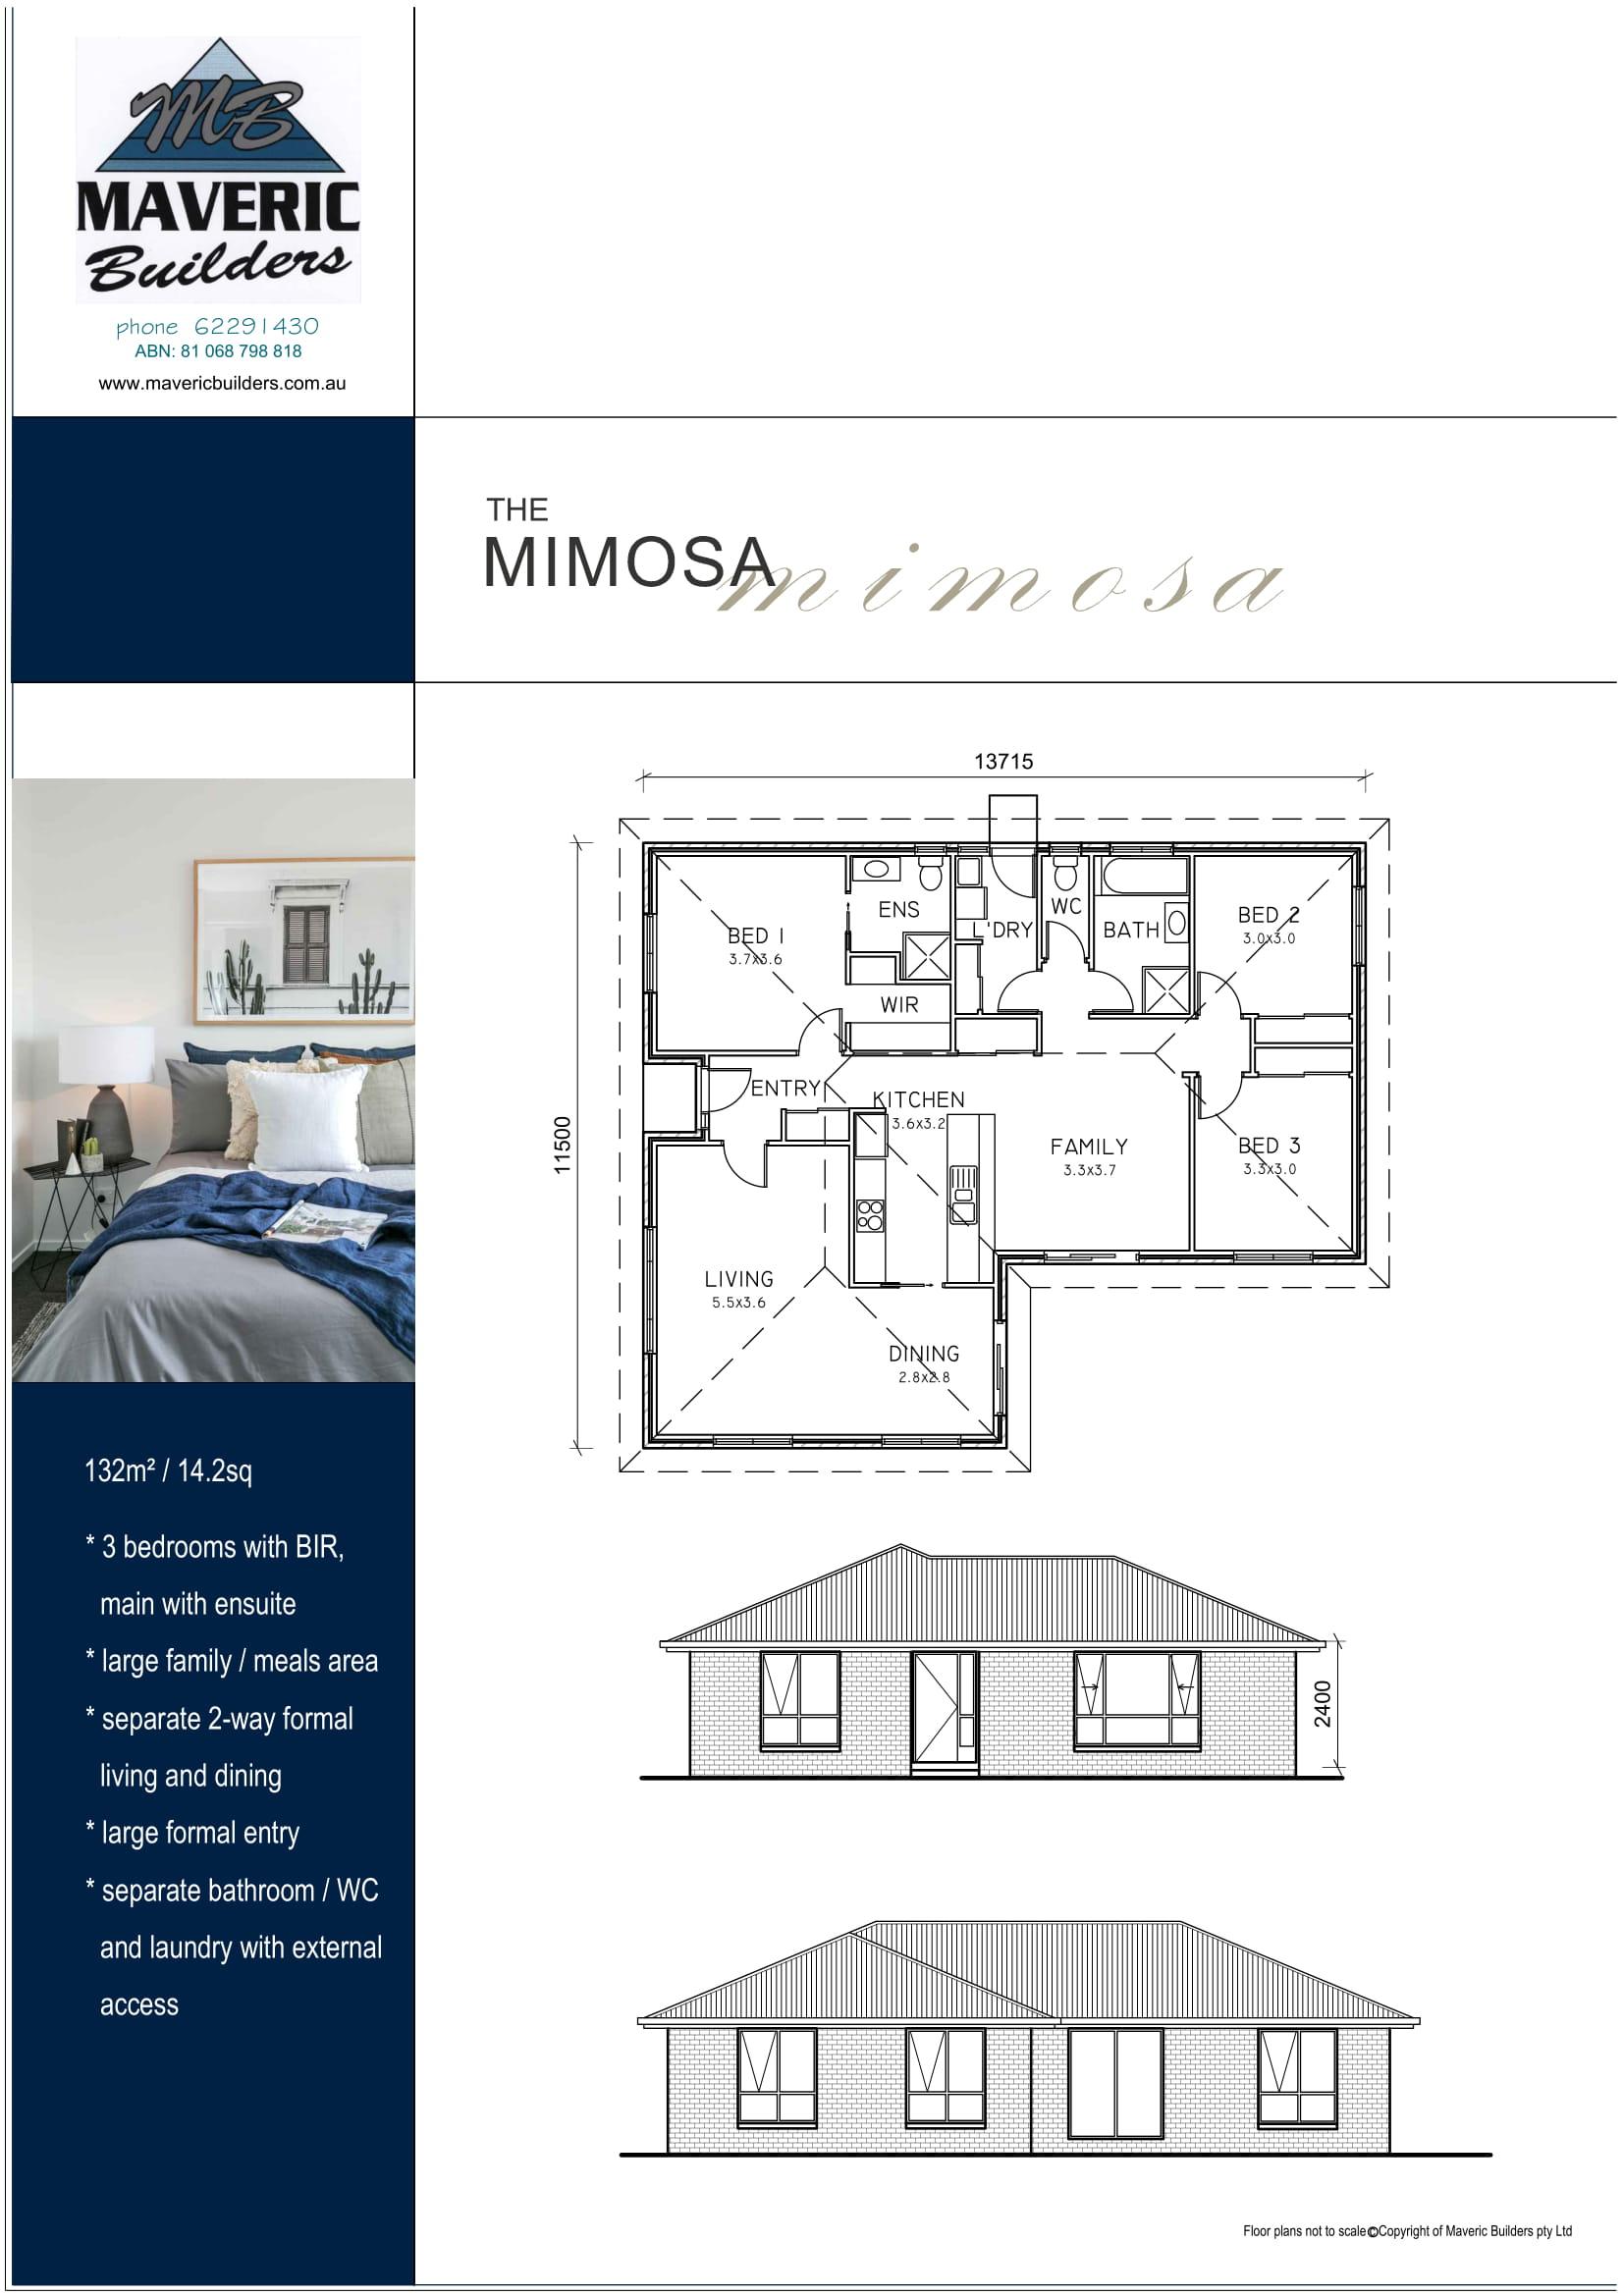 A4 Brochures 2019 01 - 24-09.jpg